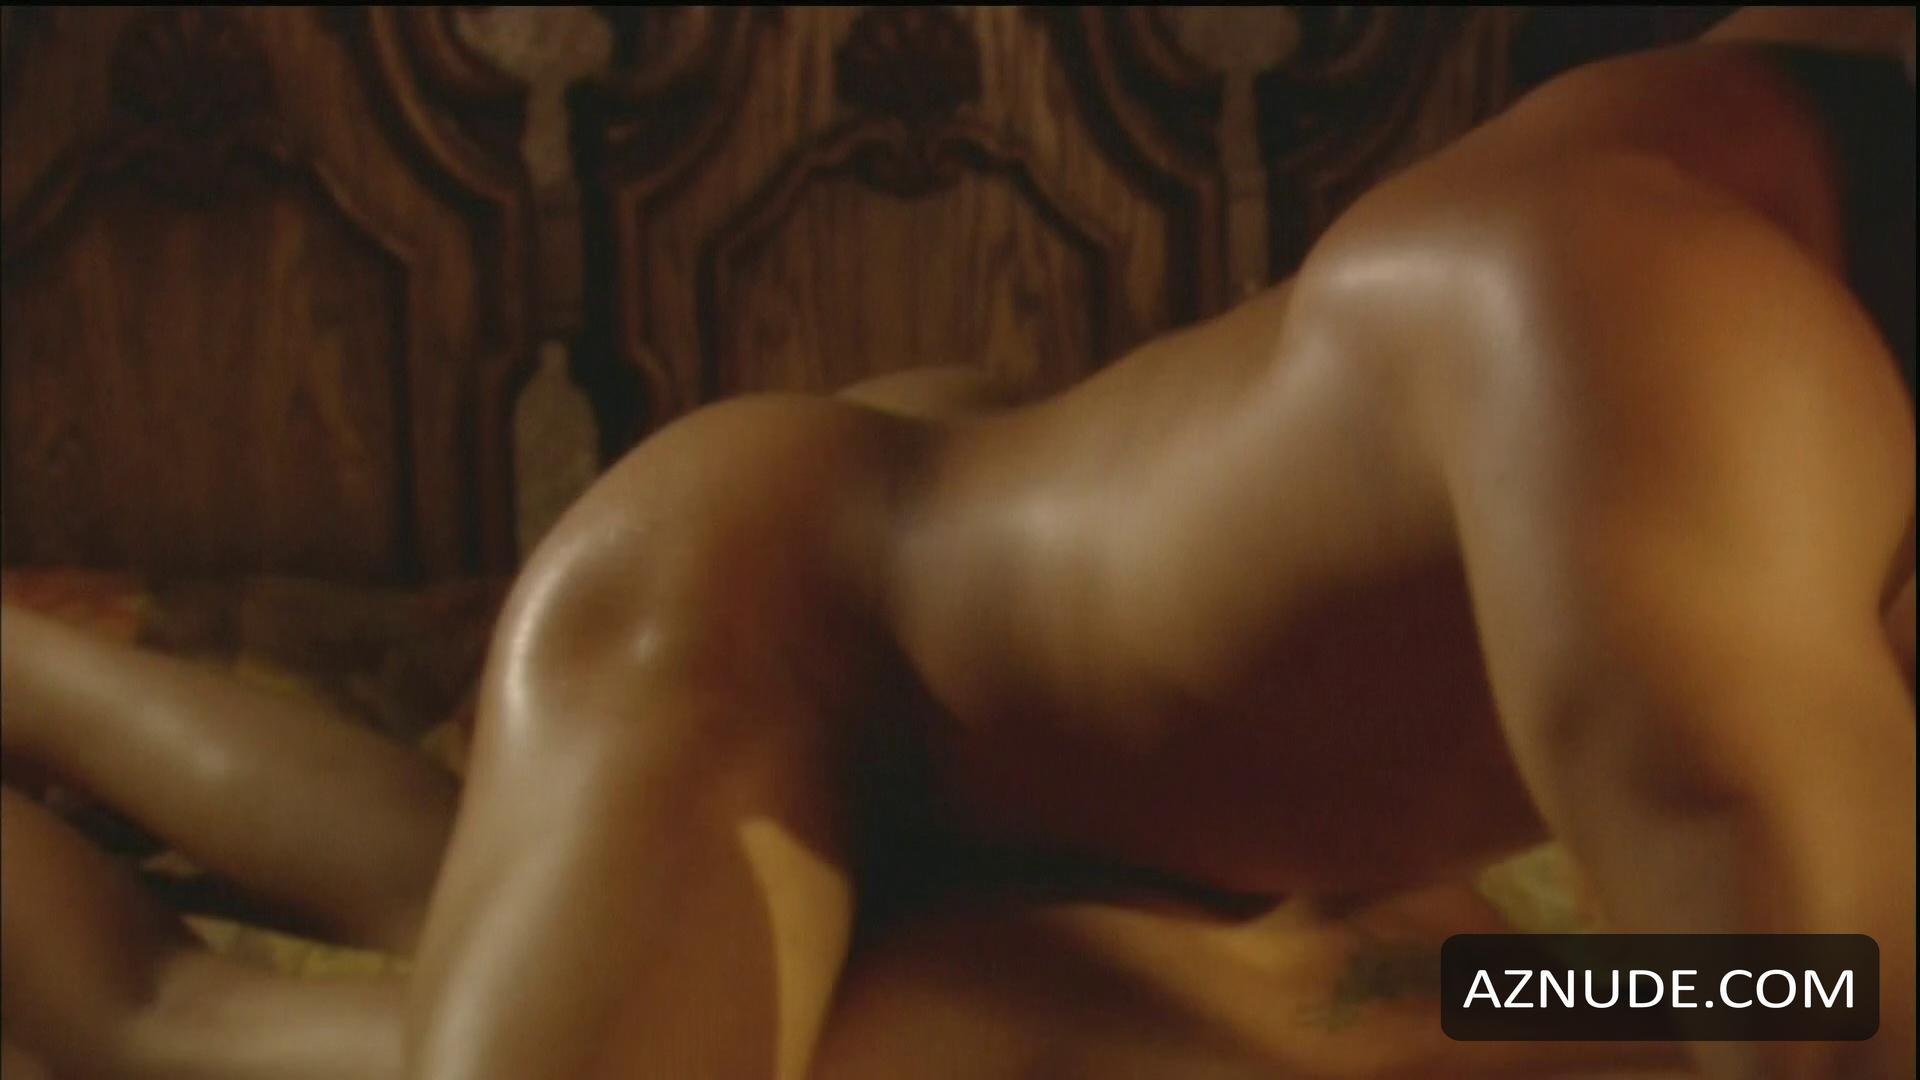 Nude Pix HQ Naked bi women